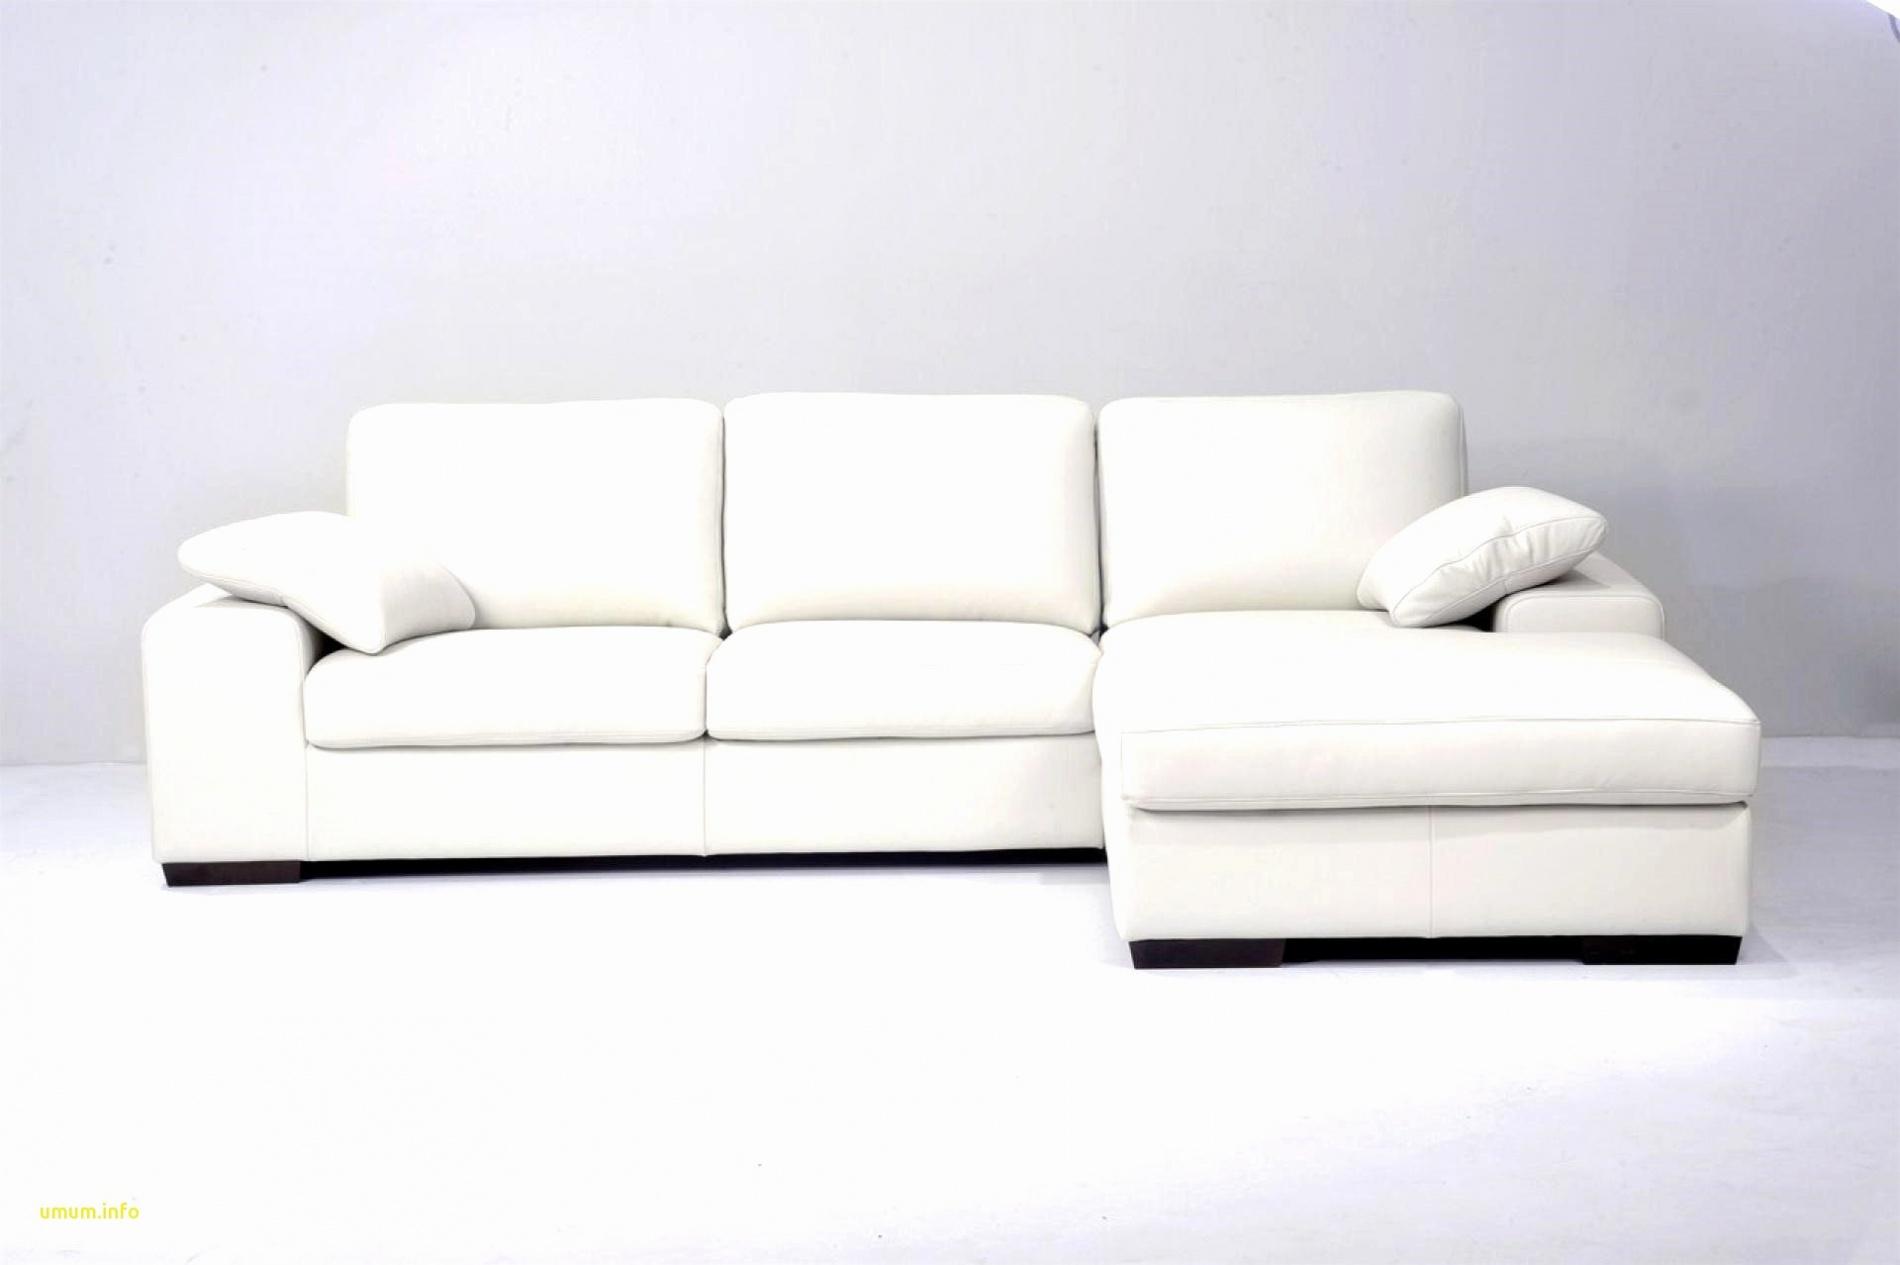 Canapé Cuir Convertible Ikea Élégant Photographie Maha De Canapé En Bois Mahagranda De Home